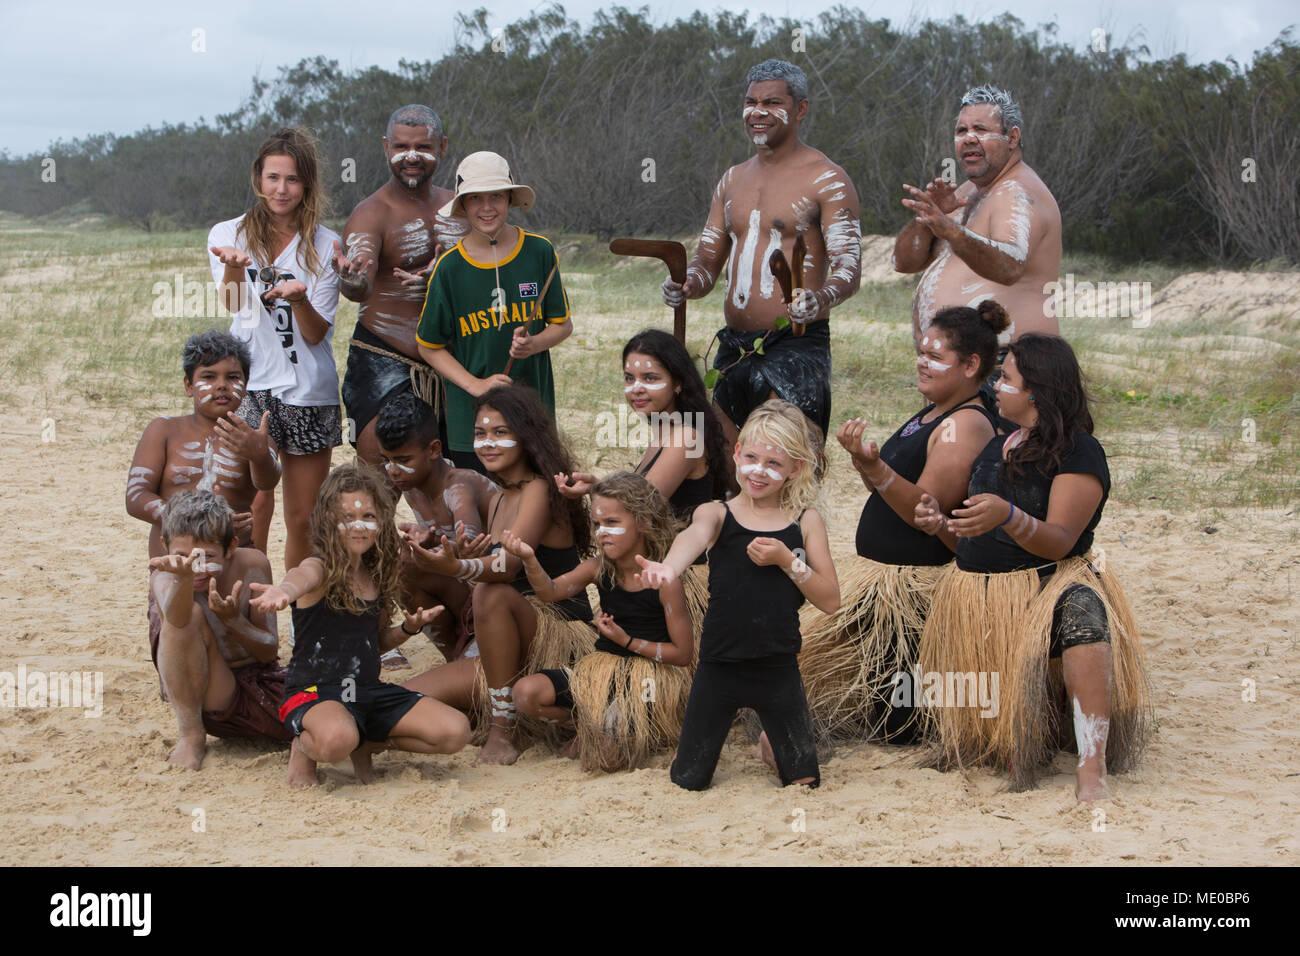 Aboriginal dance on beach, on Fraser Island, Australia, on 25 March 2018. - Stock Image